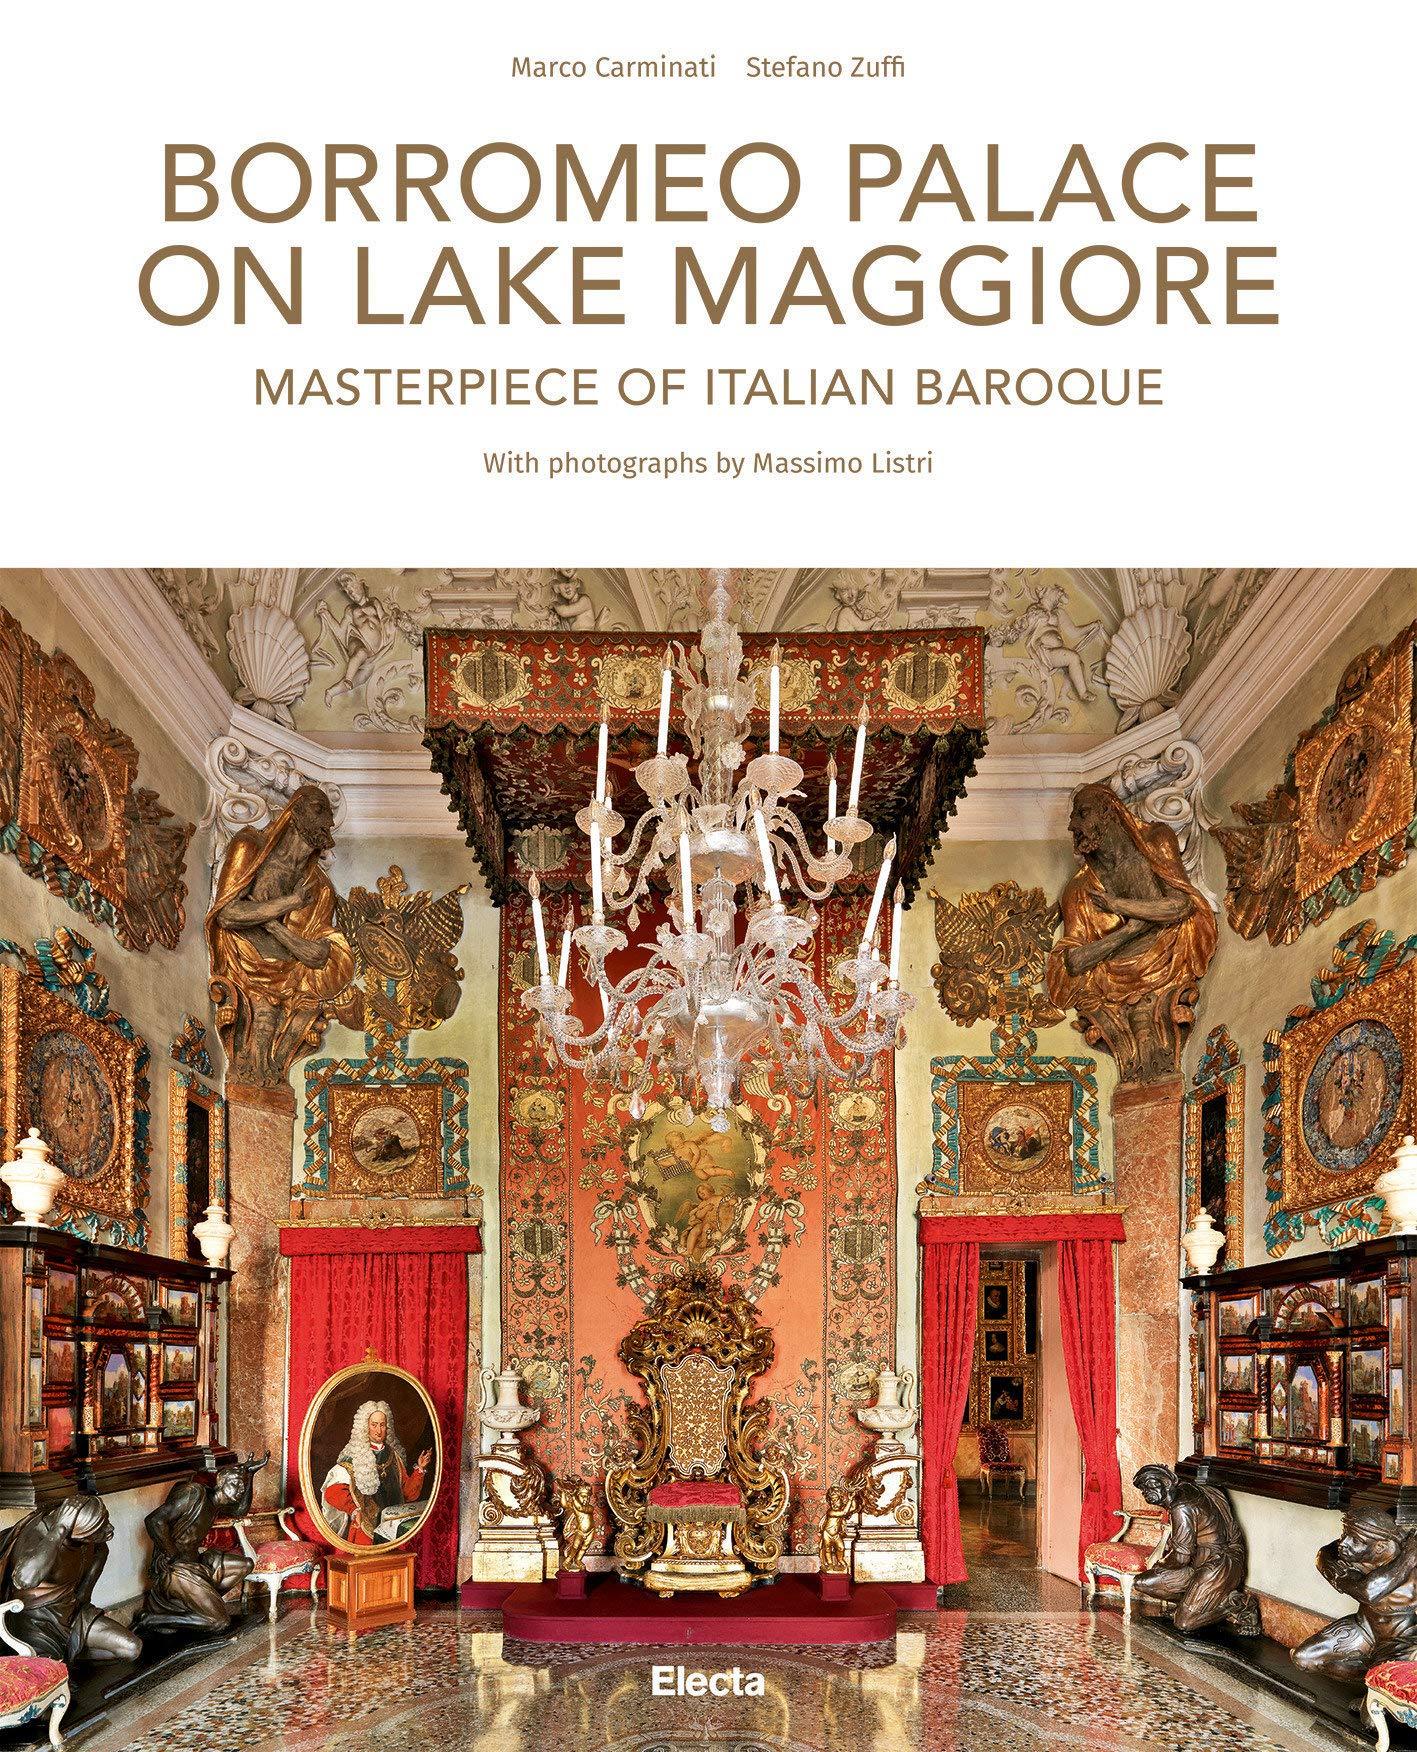 Borromeo Palace on Lake Maggiore: Masterpiece of Italian Baroque: Amazon.es: Zuffi, Stefano: Libros en idiomas extranjeros